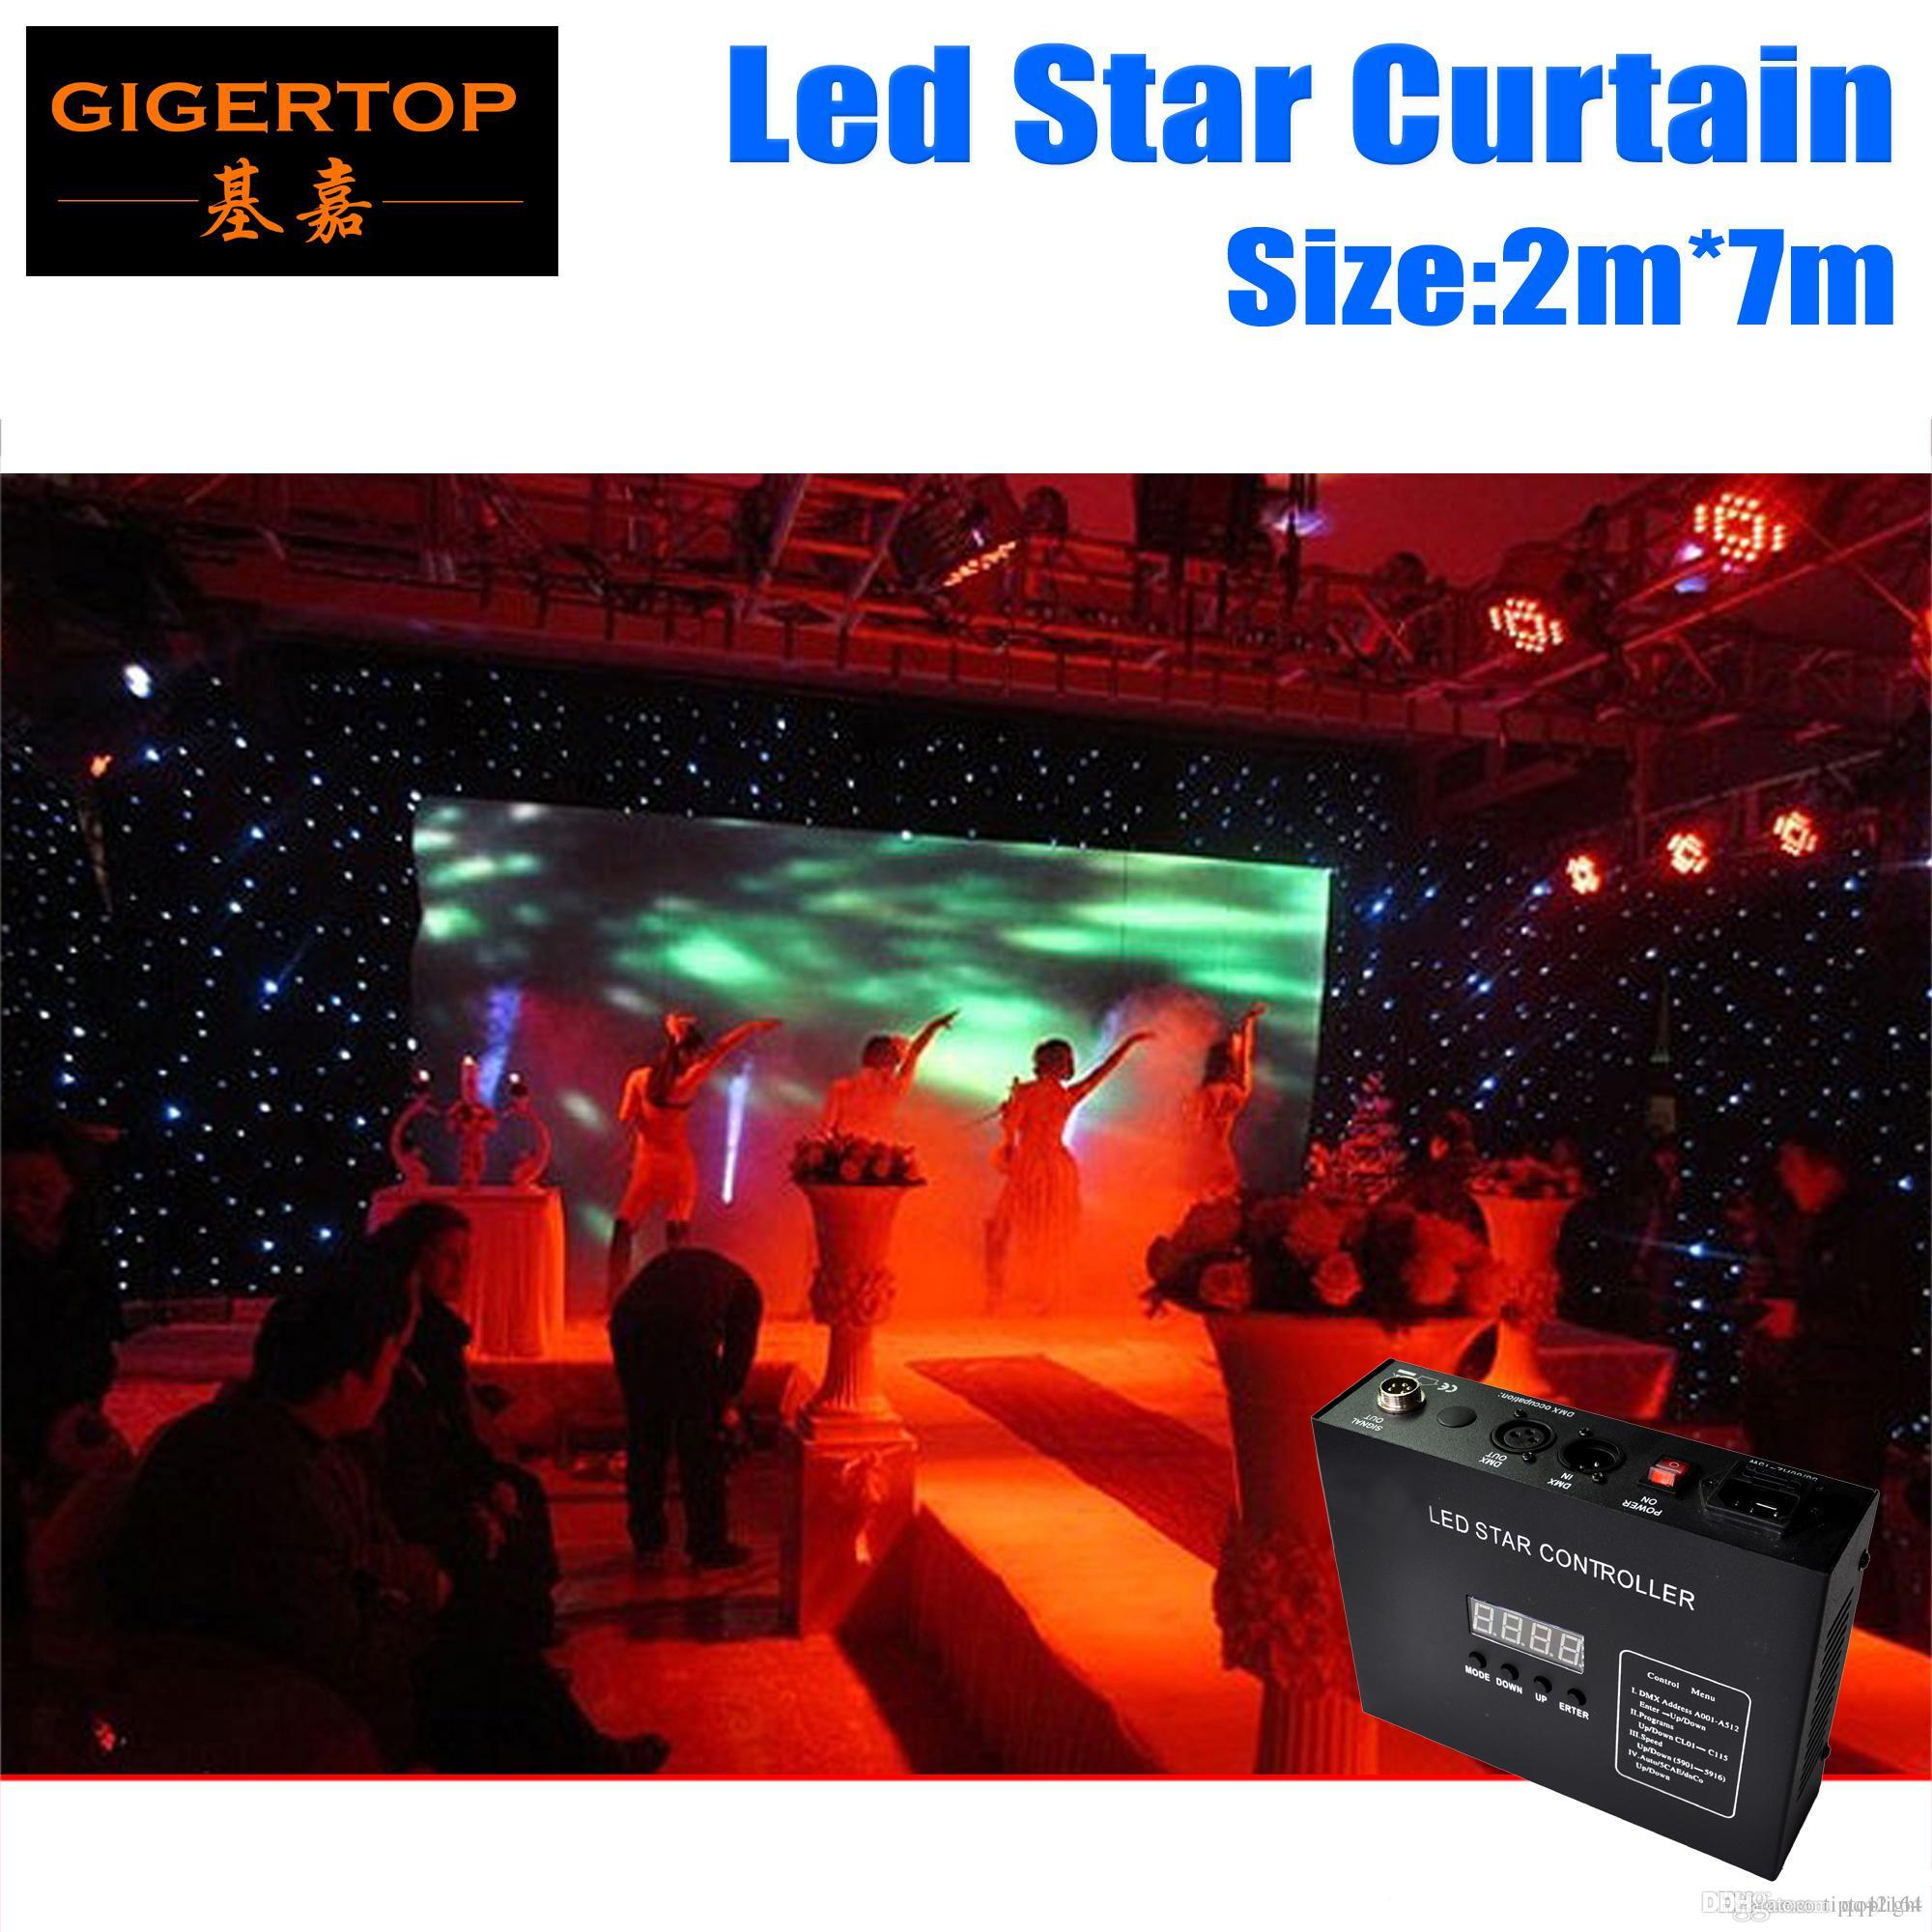 High Quality 2M*7M&7M*2M LED Star Curtain,White blue/ RGBW/RGB Colored LED Stage Backdrop,LED Star Cloth for Wedding Decoration 90V-240V